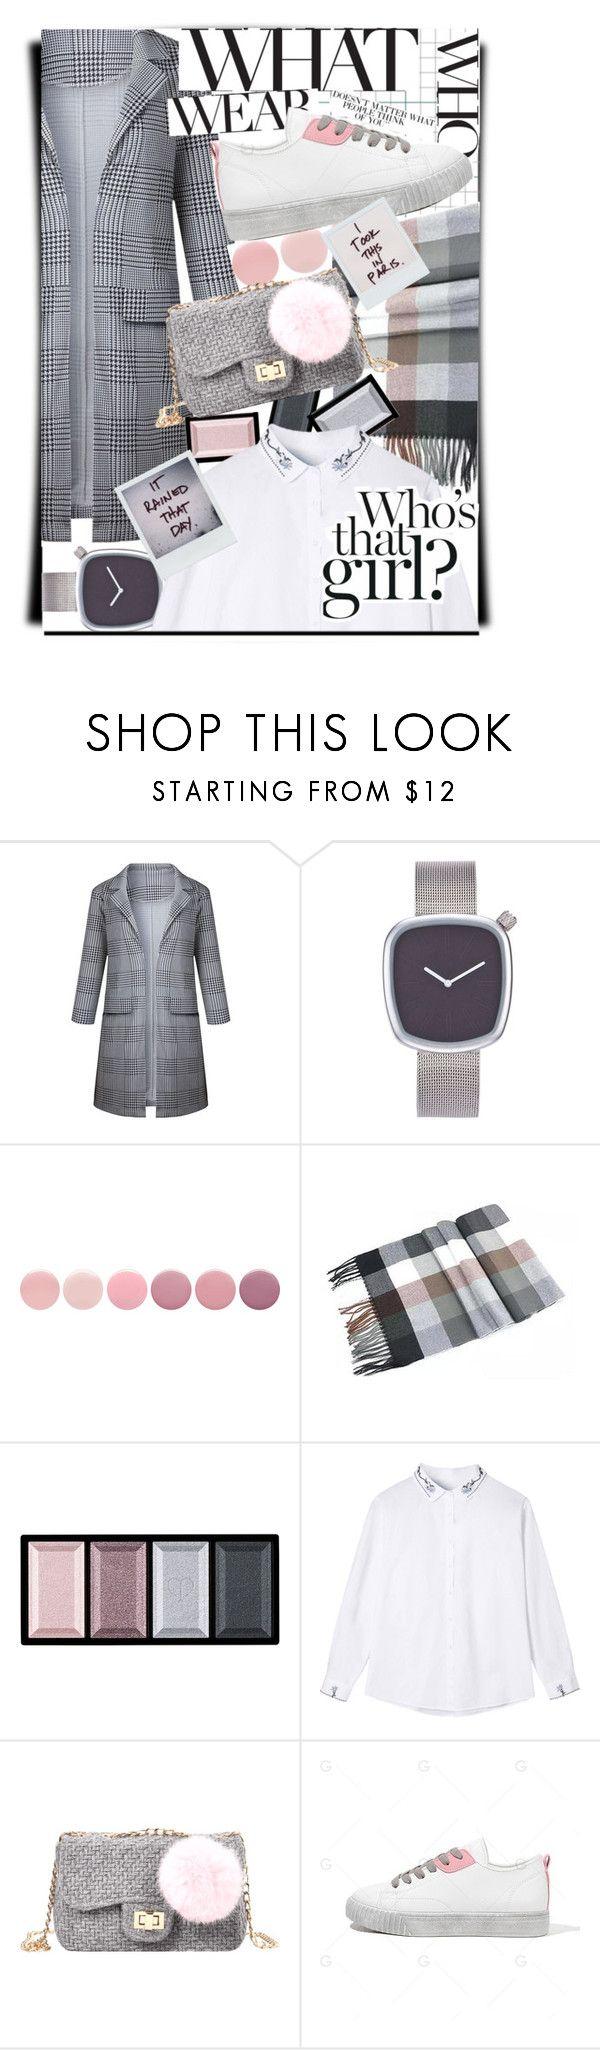 """Gray fashion rhapsody,sing me that melody🌫"" by jelena-bozovic-1 on Polyvore featuring Deborah Lippmann, Clé de Peau Beauté, Who What Wear, Gwyneth Shoes and Polaroid"